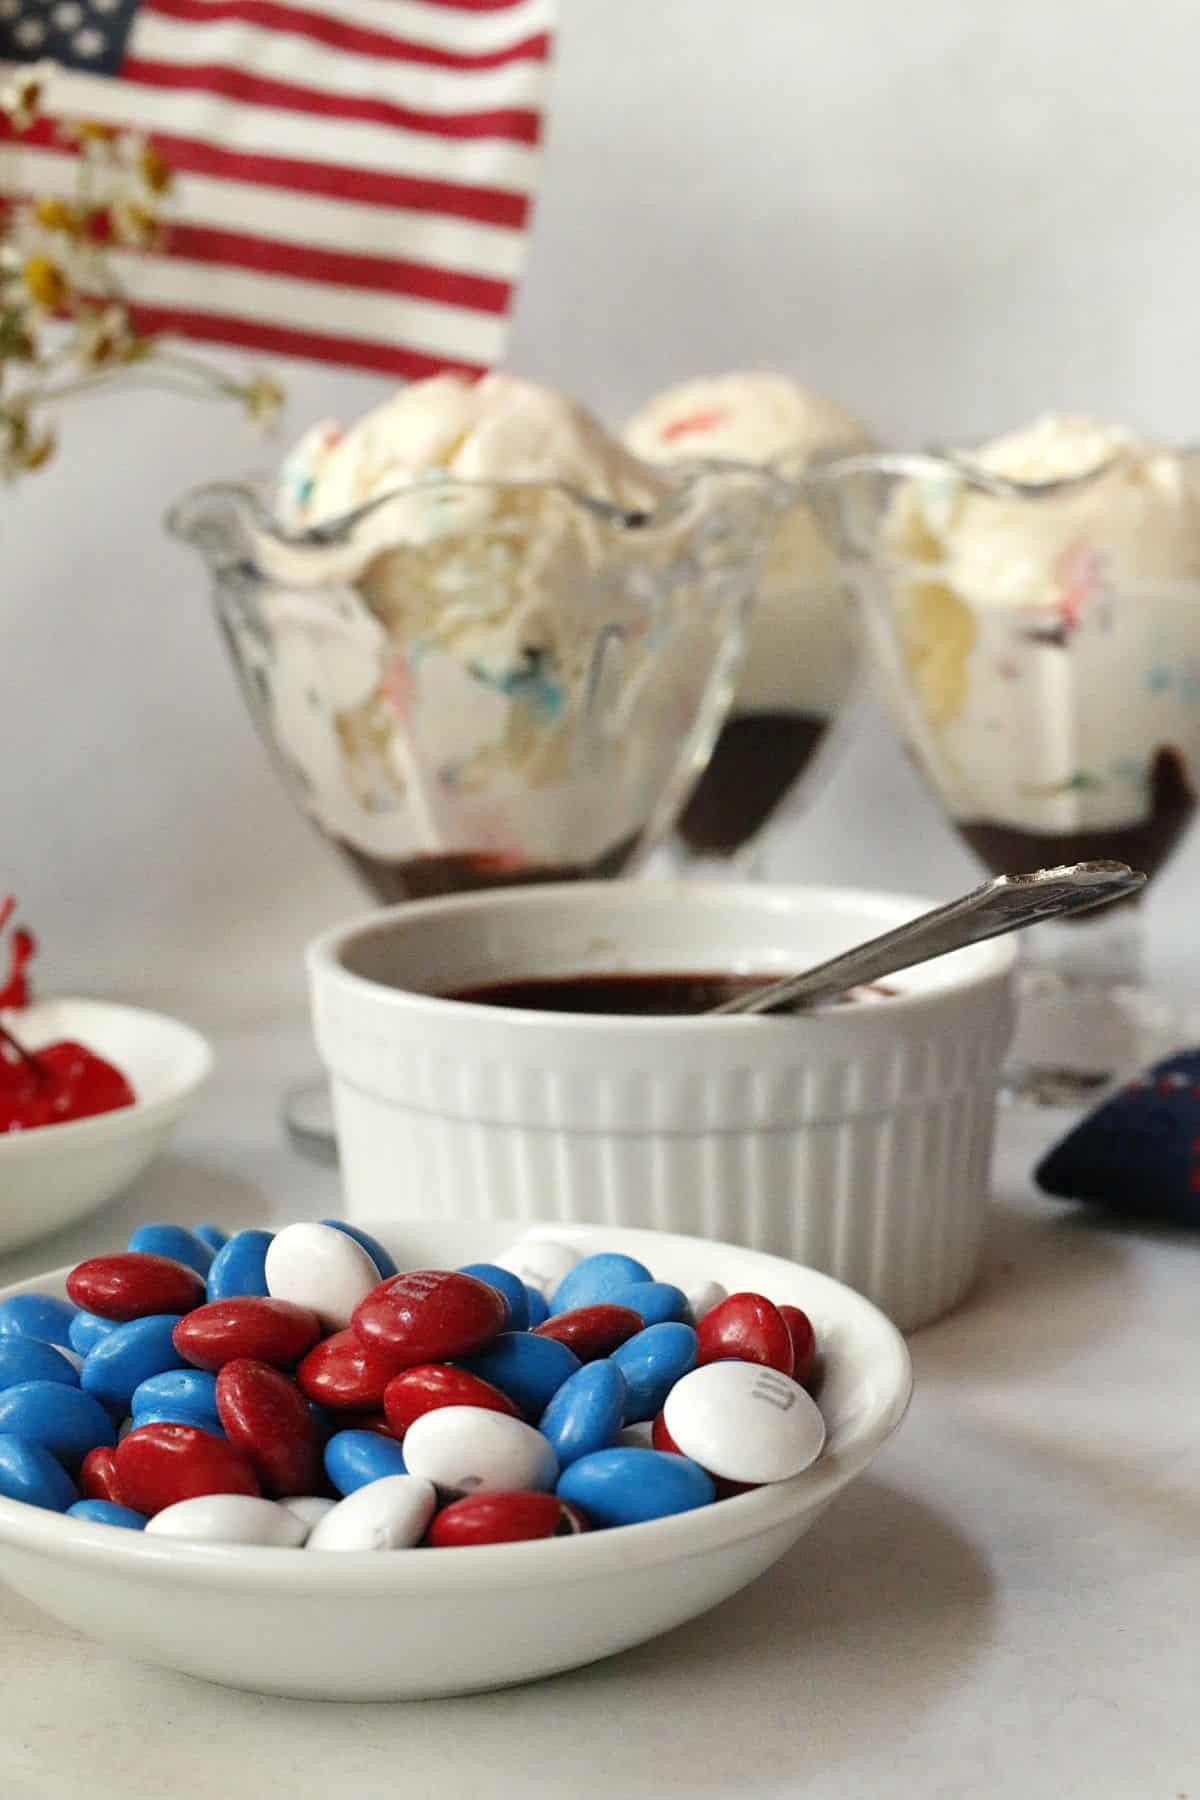 Dessert glasses filled with vanilla ice cream and M&M's